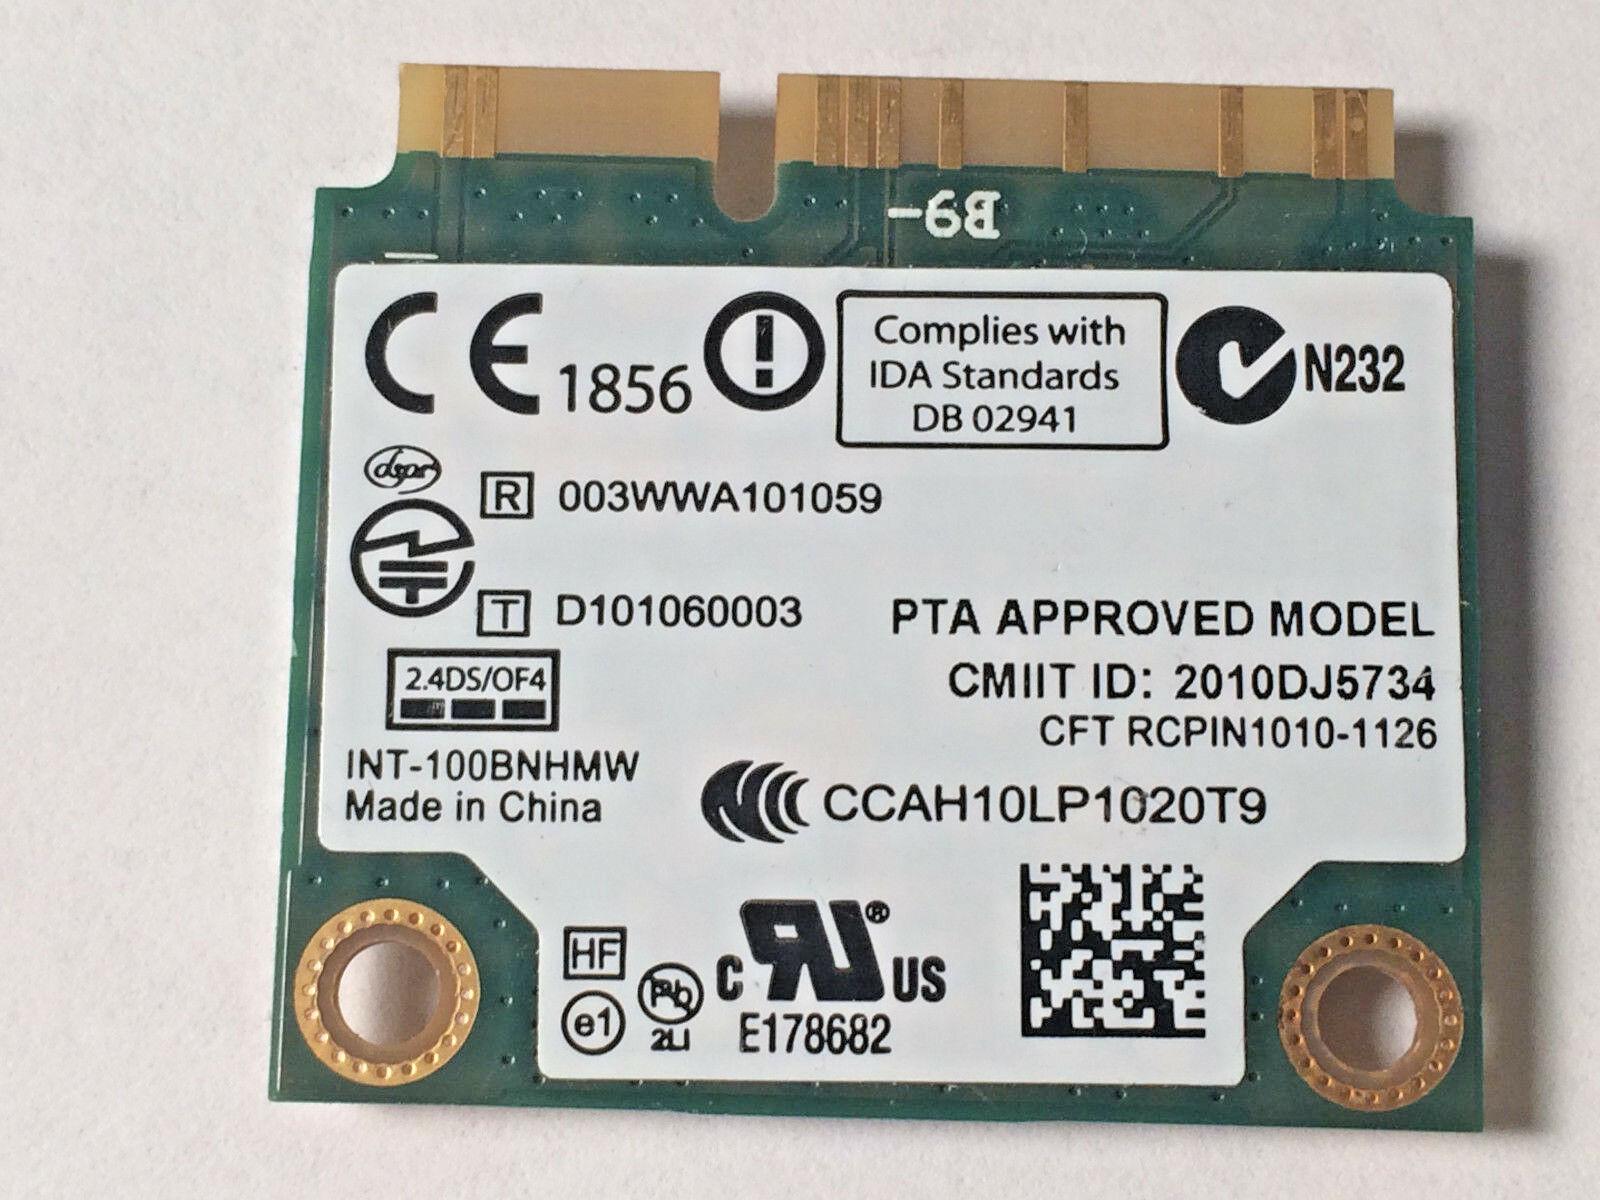 Intel Centrino Wireless-N 100 b/g/n 100BNHMW b/g/n PCI-E Half Mini WiFi Card image 2